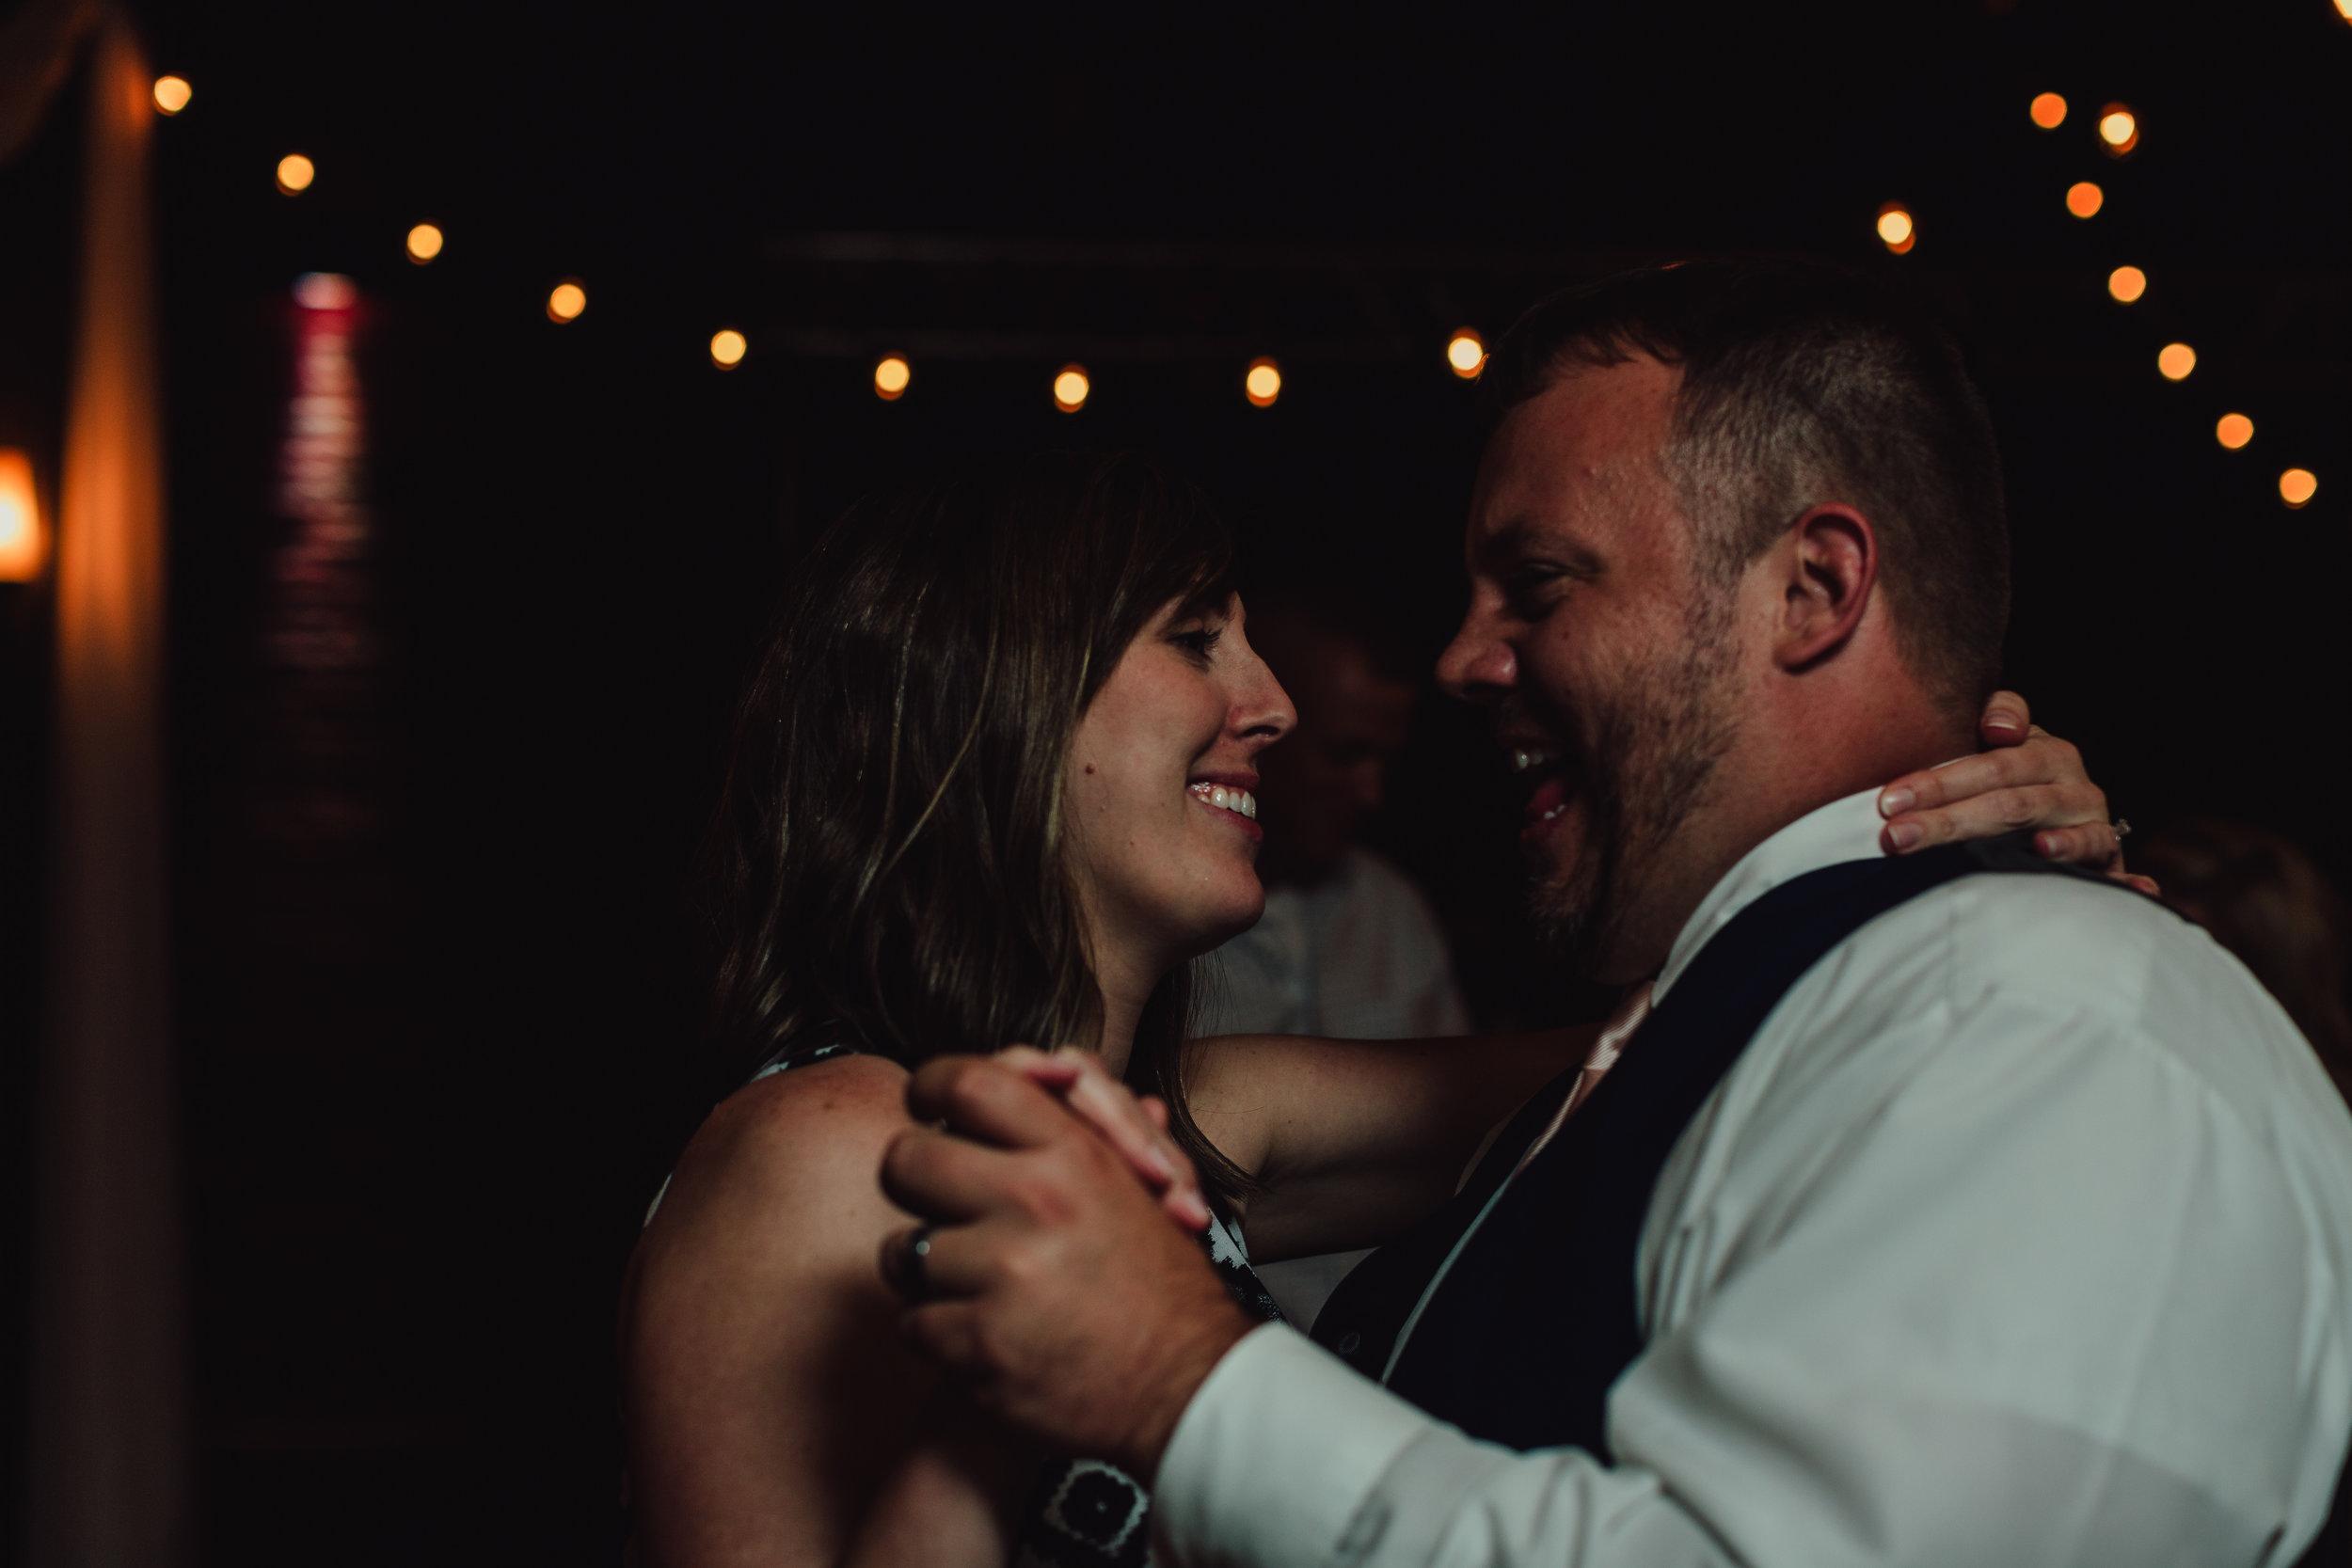 east-tn-wedding-photographer-tennessee-elopement-photographer-kingsport-tn-wedding-photographer (964 of 1001).jpg